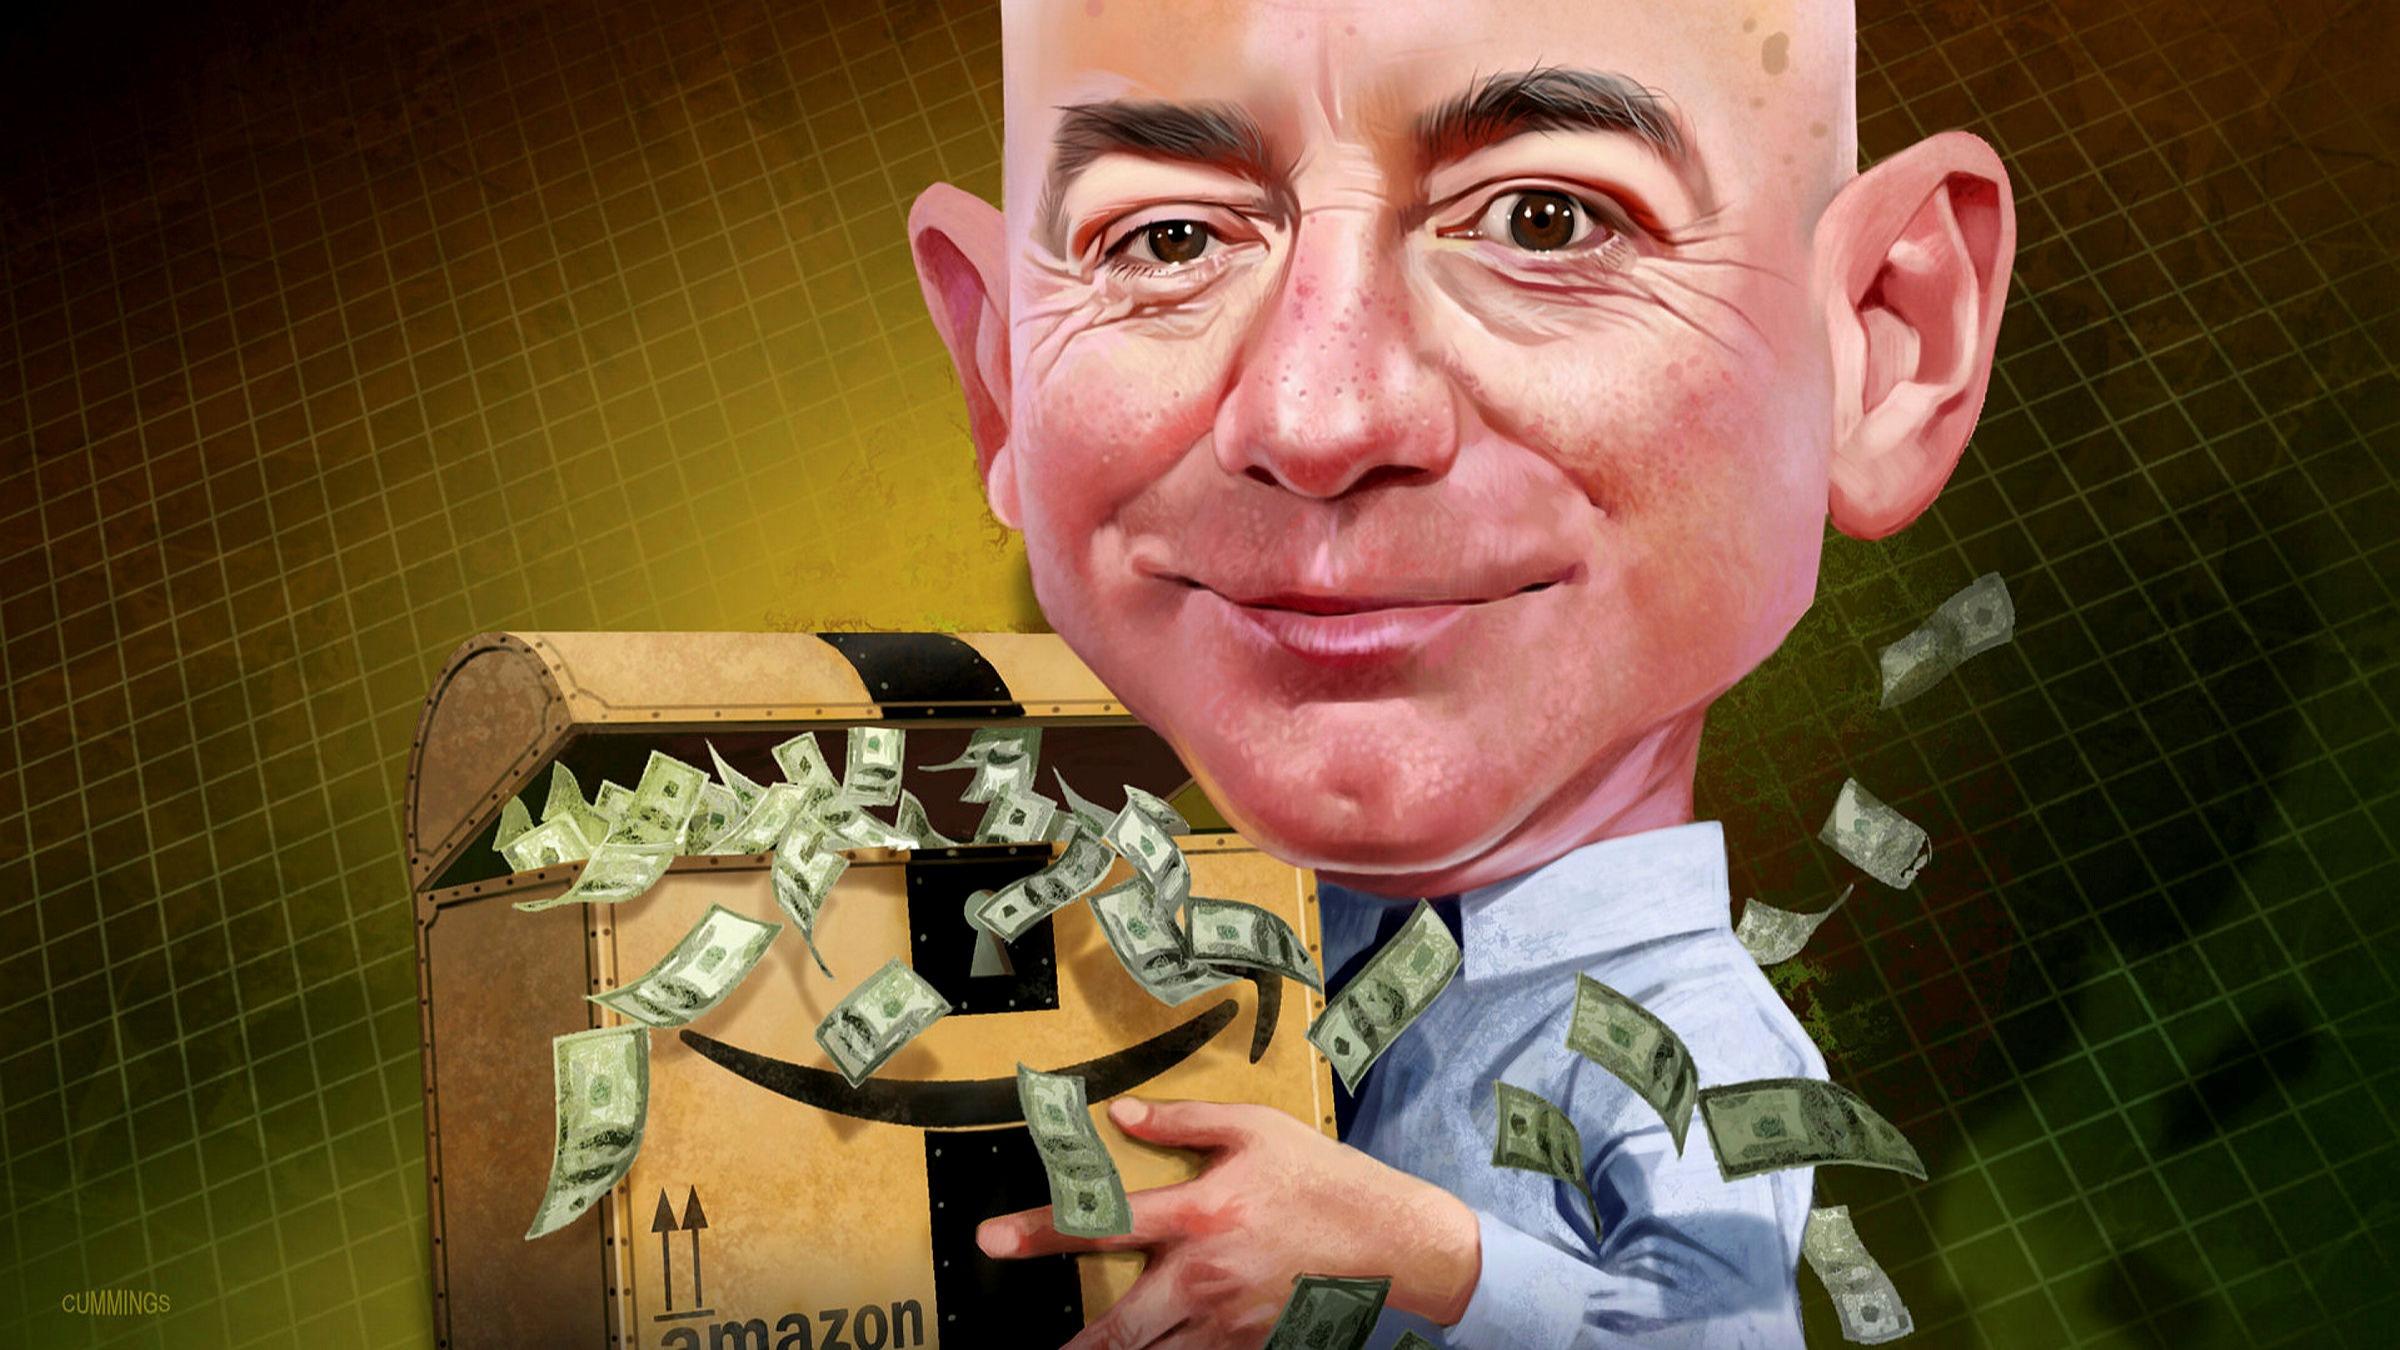 Jeff Bezos Amazon Billionaire In The Hot Seat Financial Times